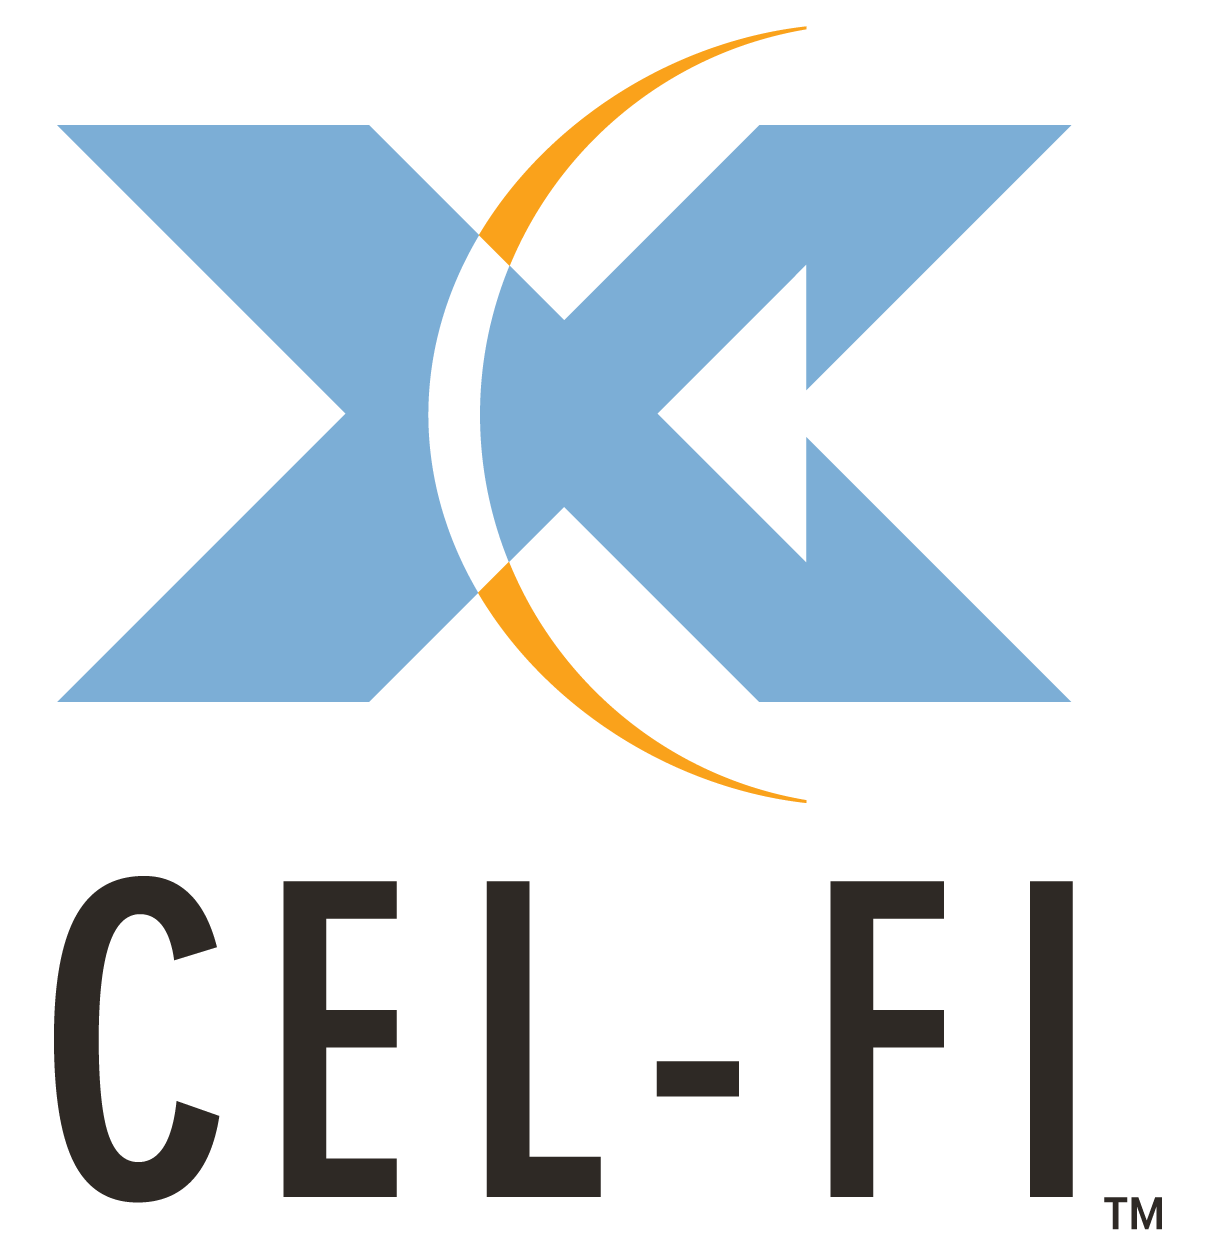 CEL-FI